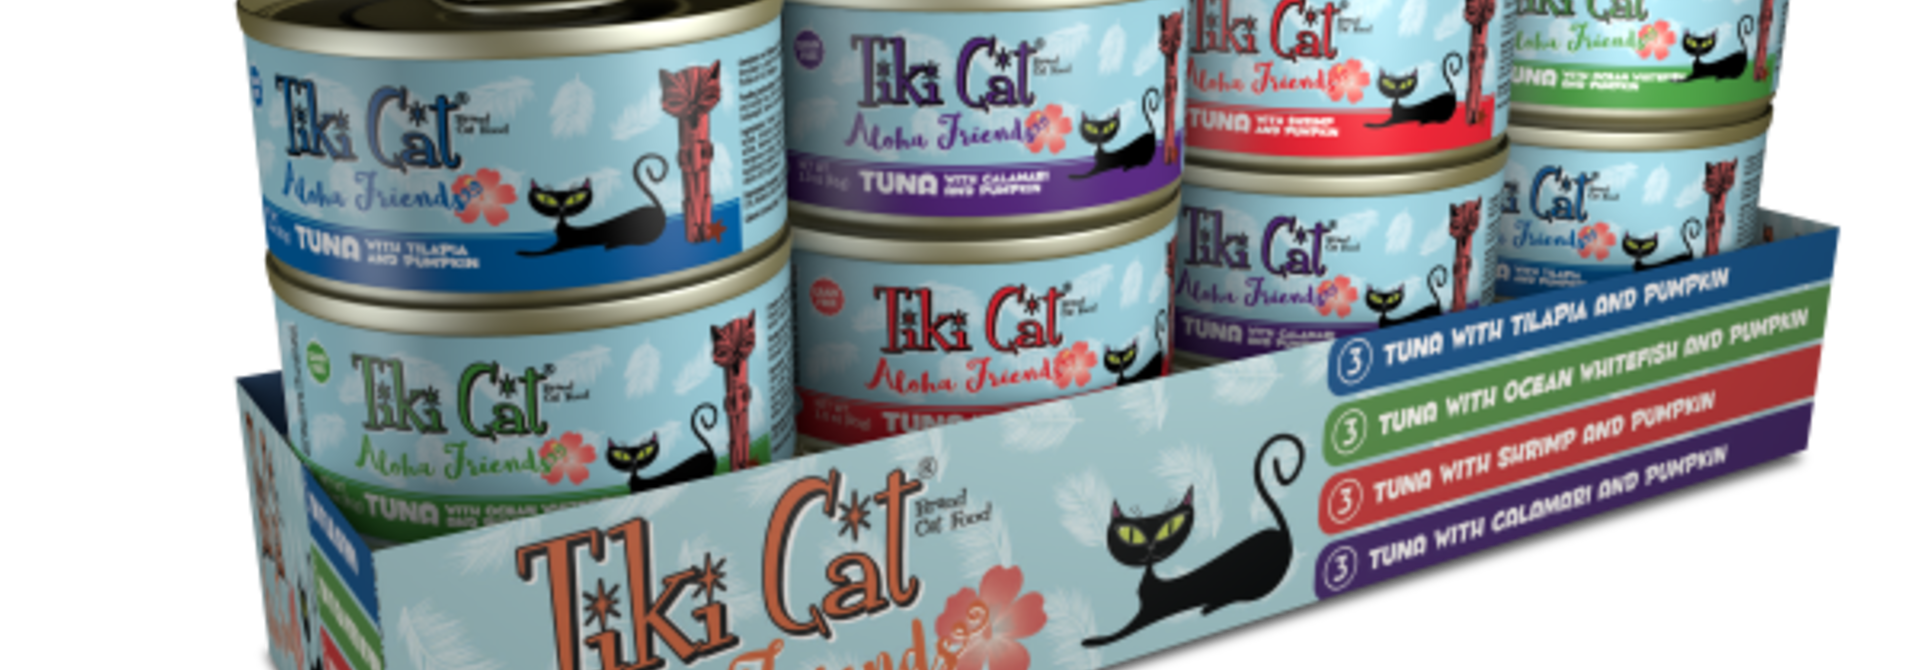 Tiki Cat Aloha Friends GF Variety Pack 12/3 oz